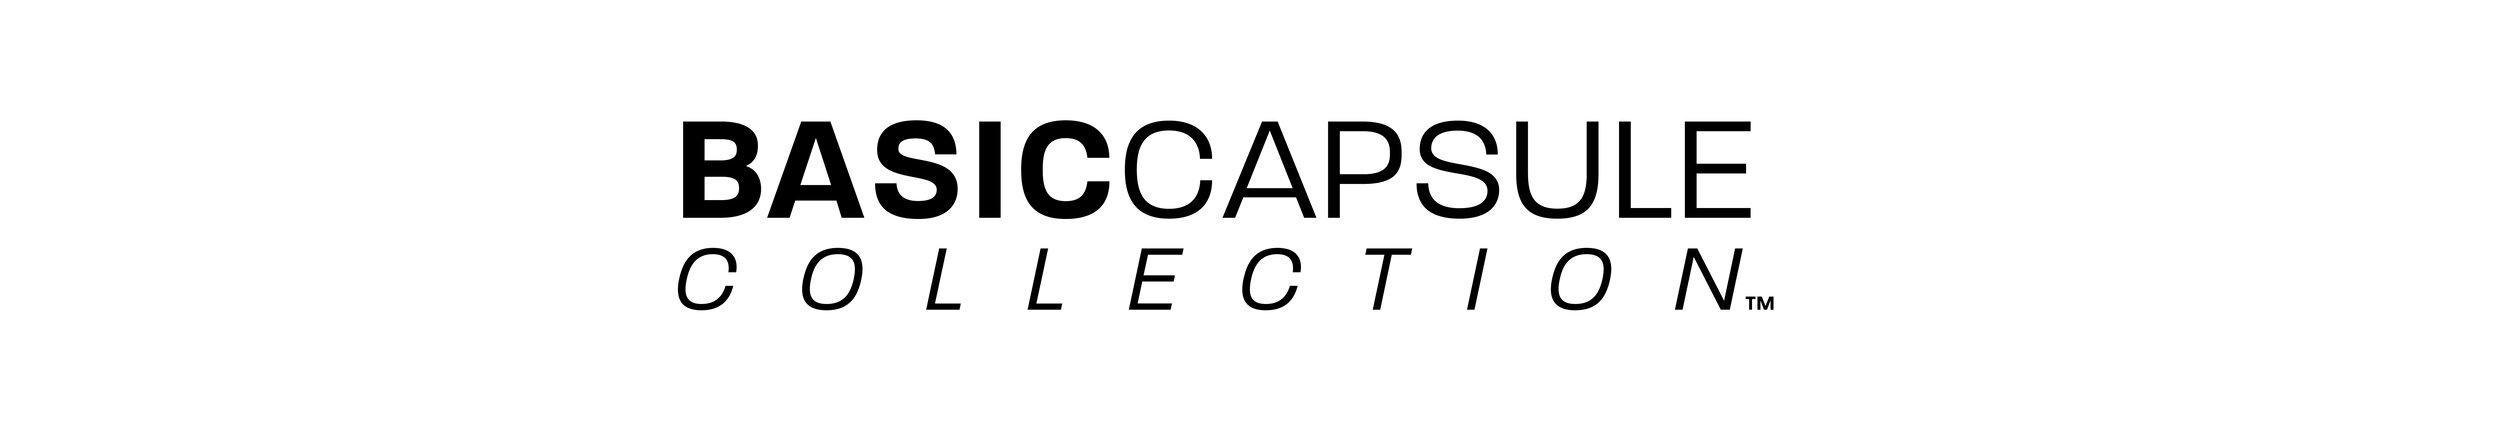 Basic_Capsule_logo_WIDE-06.jpg